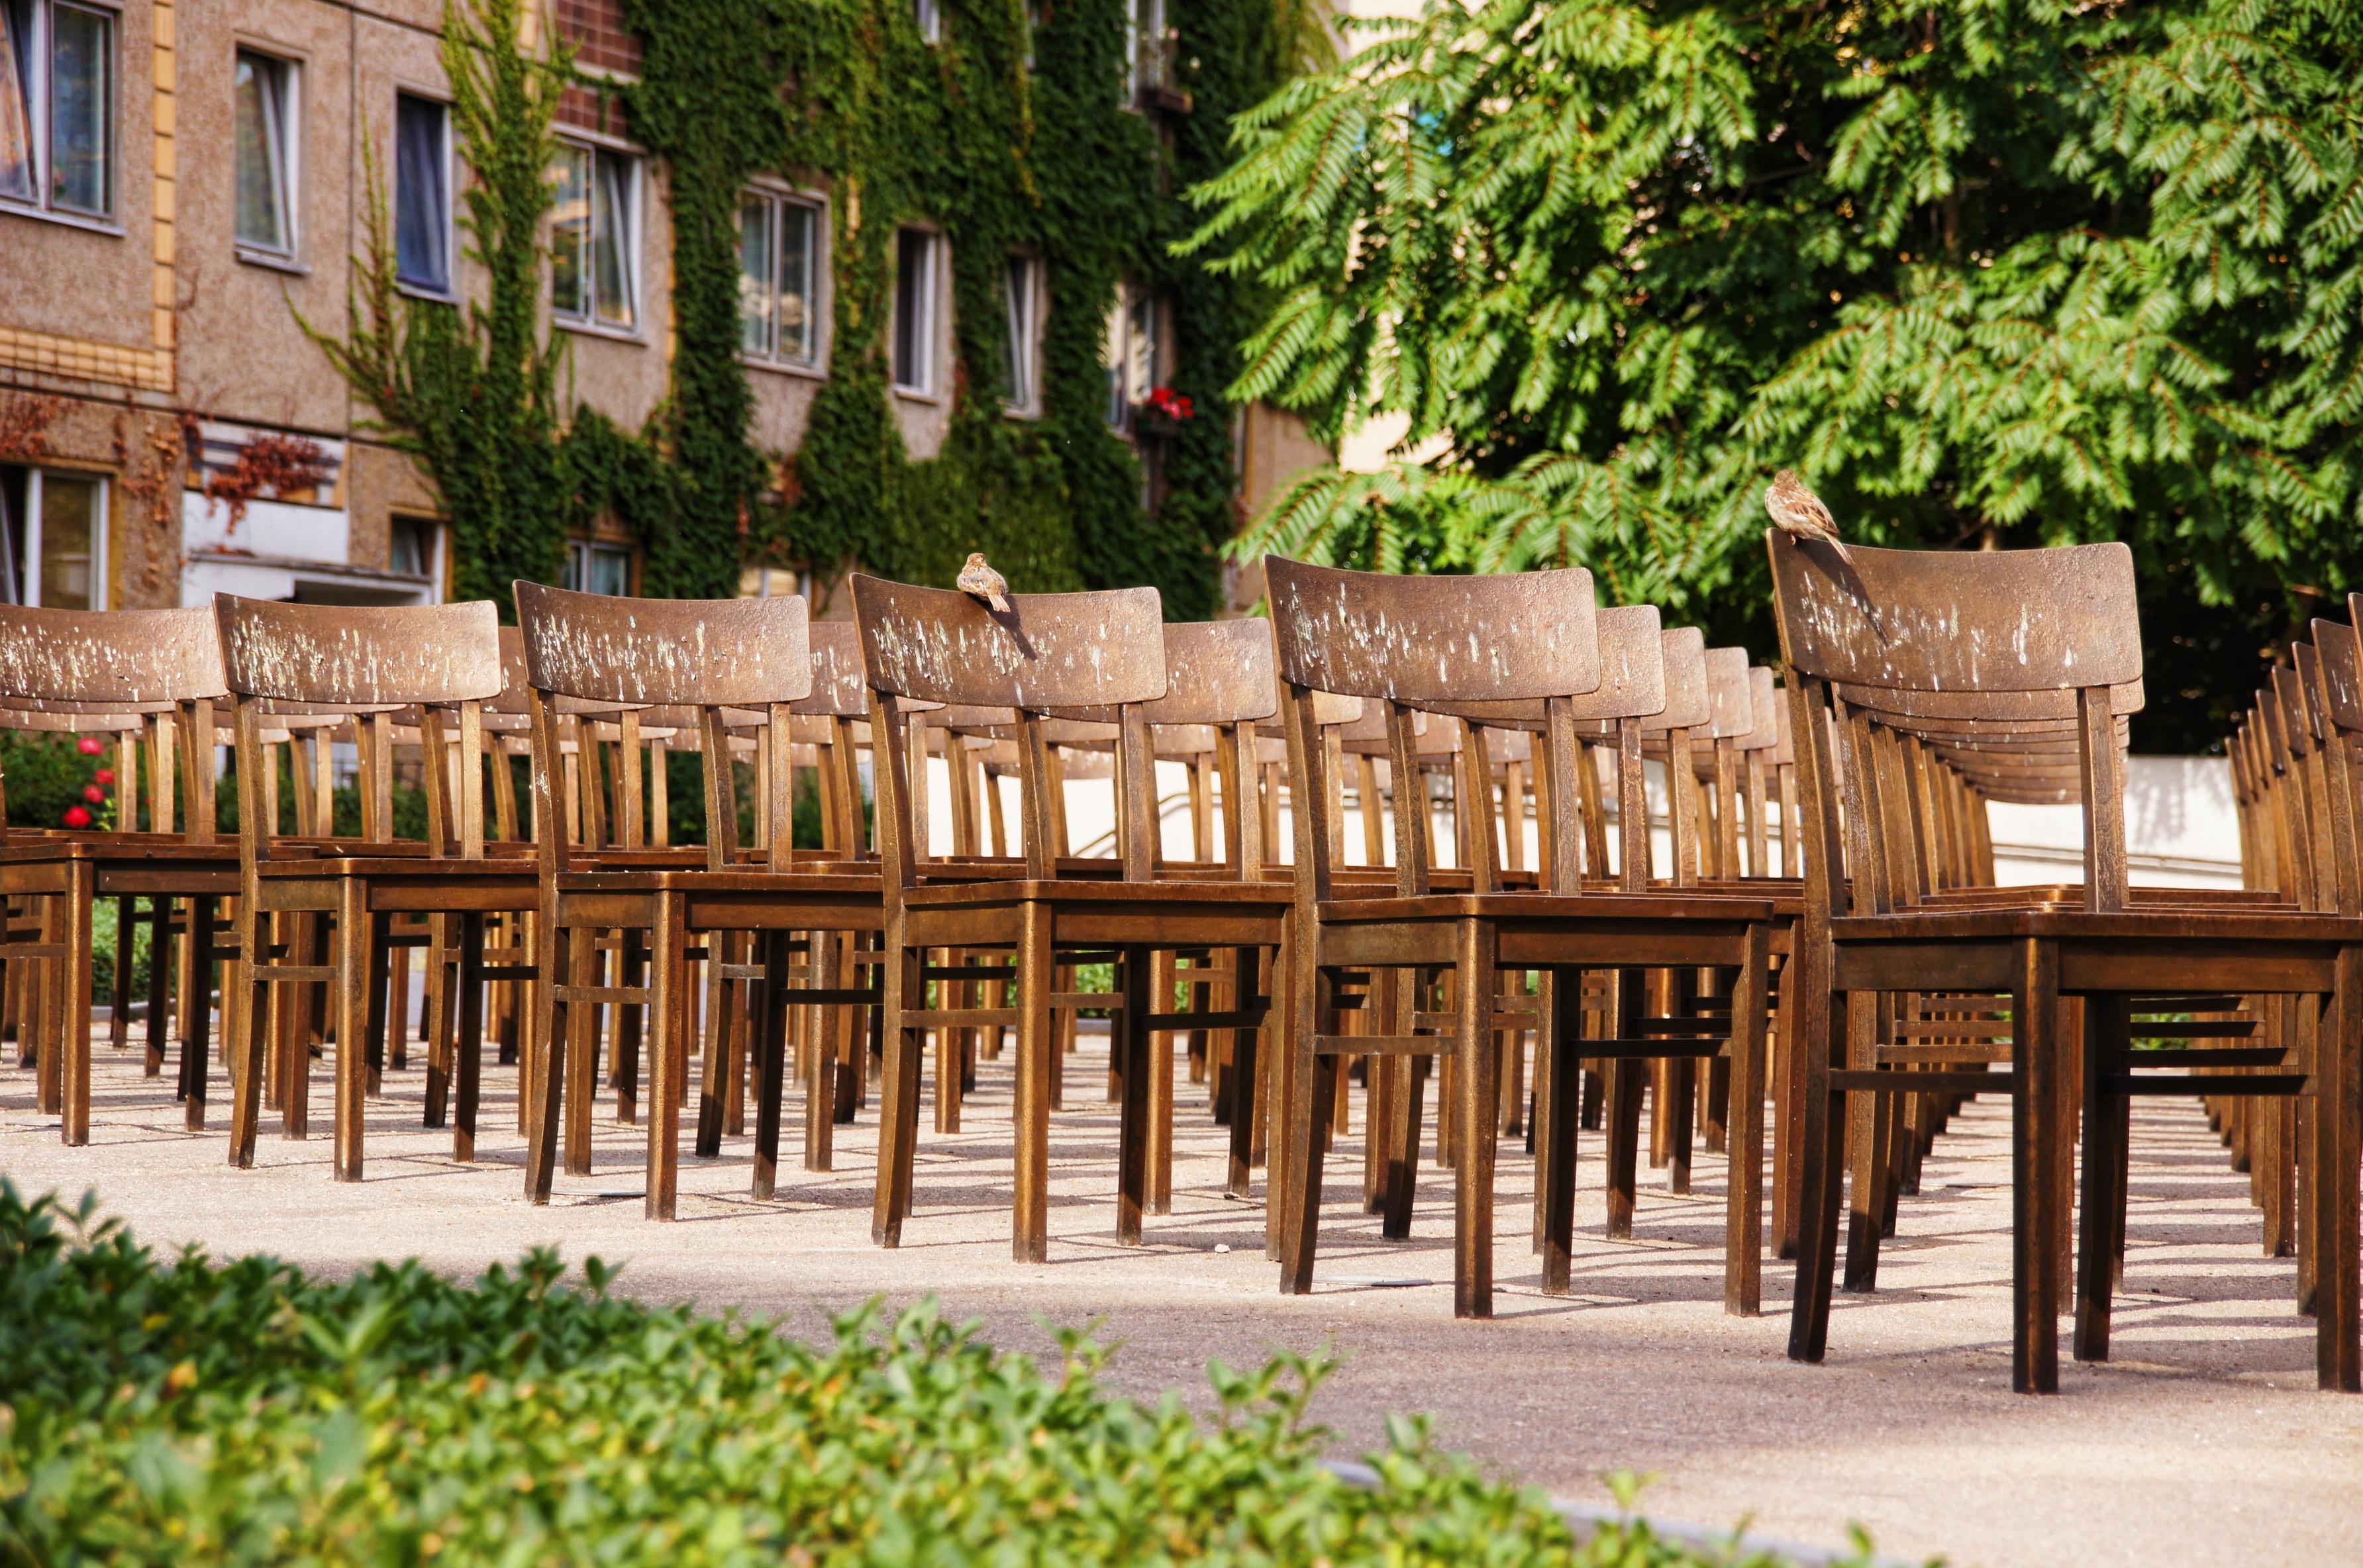 Wood Backyard Religion Furniture Garden Artwork Places Of Interest Chairs Art Courtyard Leipzig Bronze Estate Synagogue